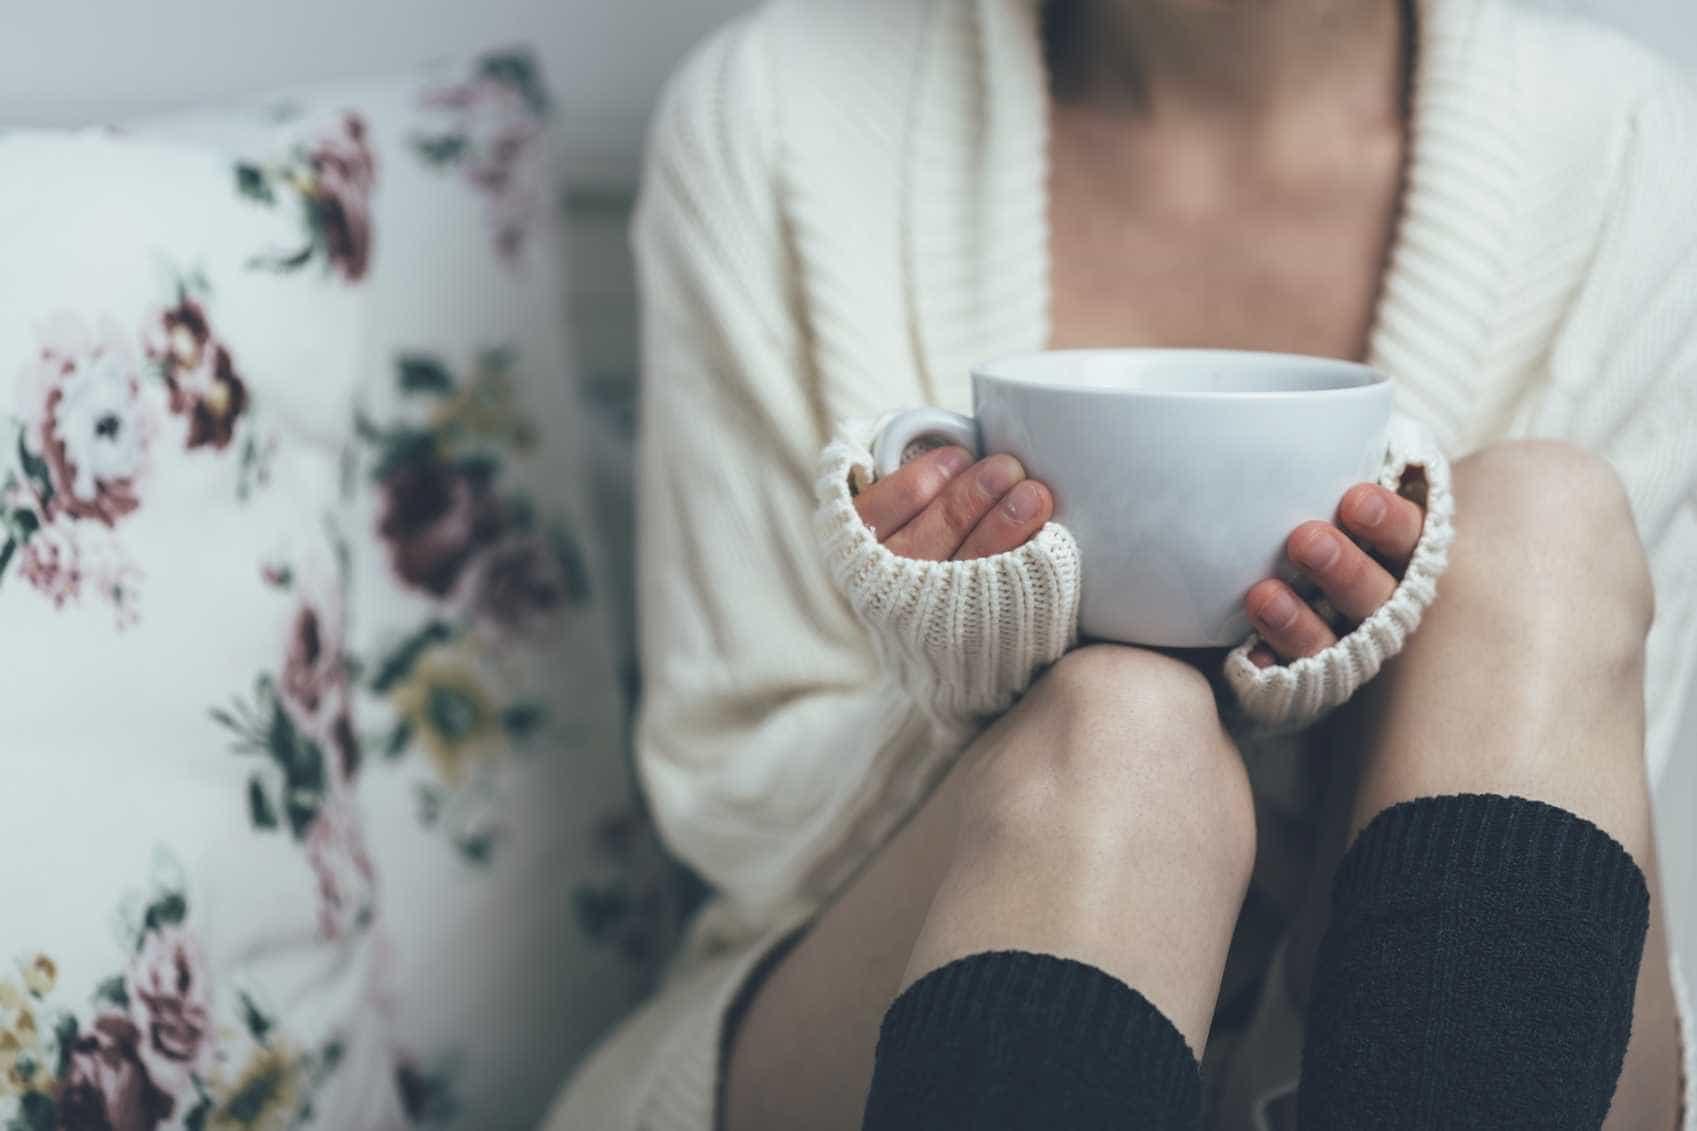 Bebidas demasiado quentes podem causar cancro do esófago